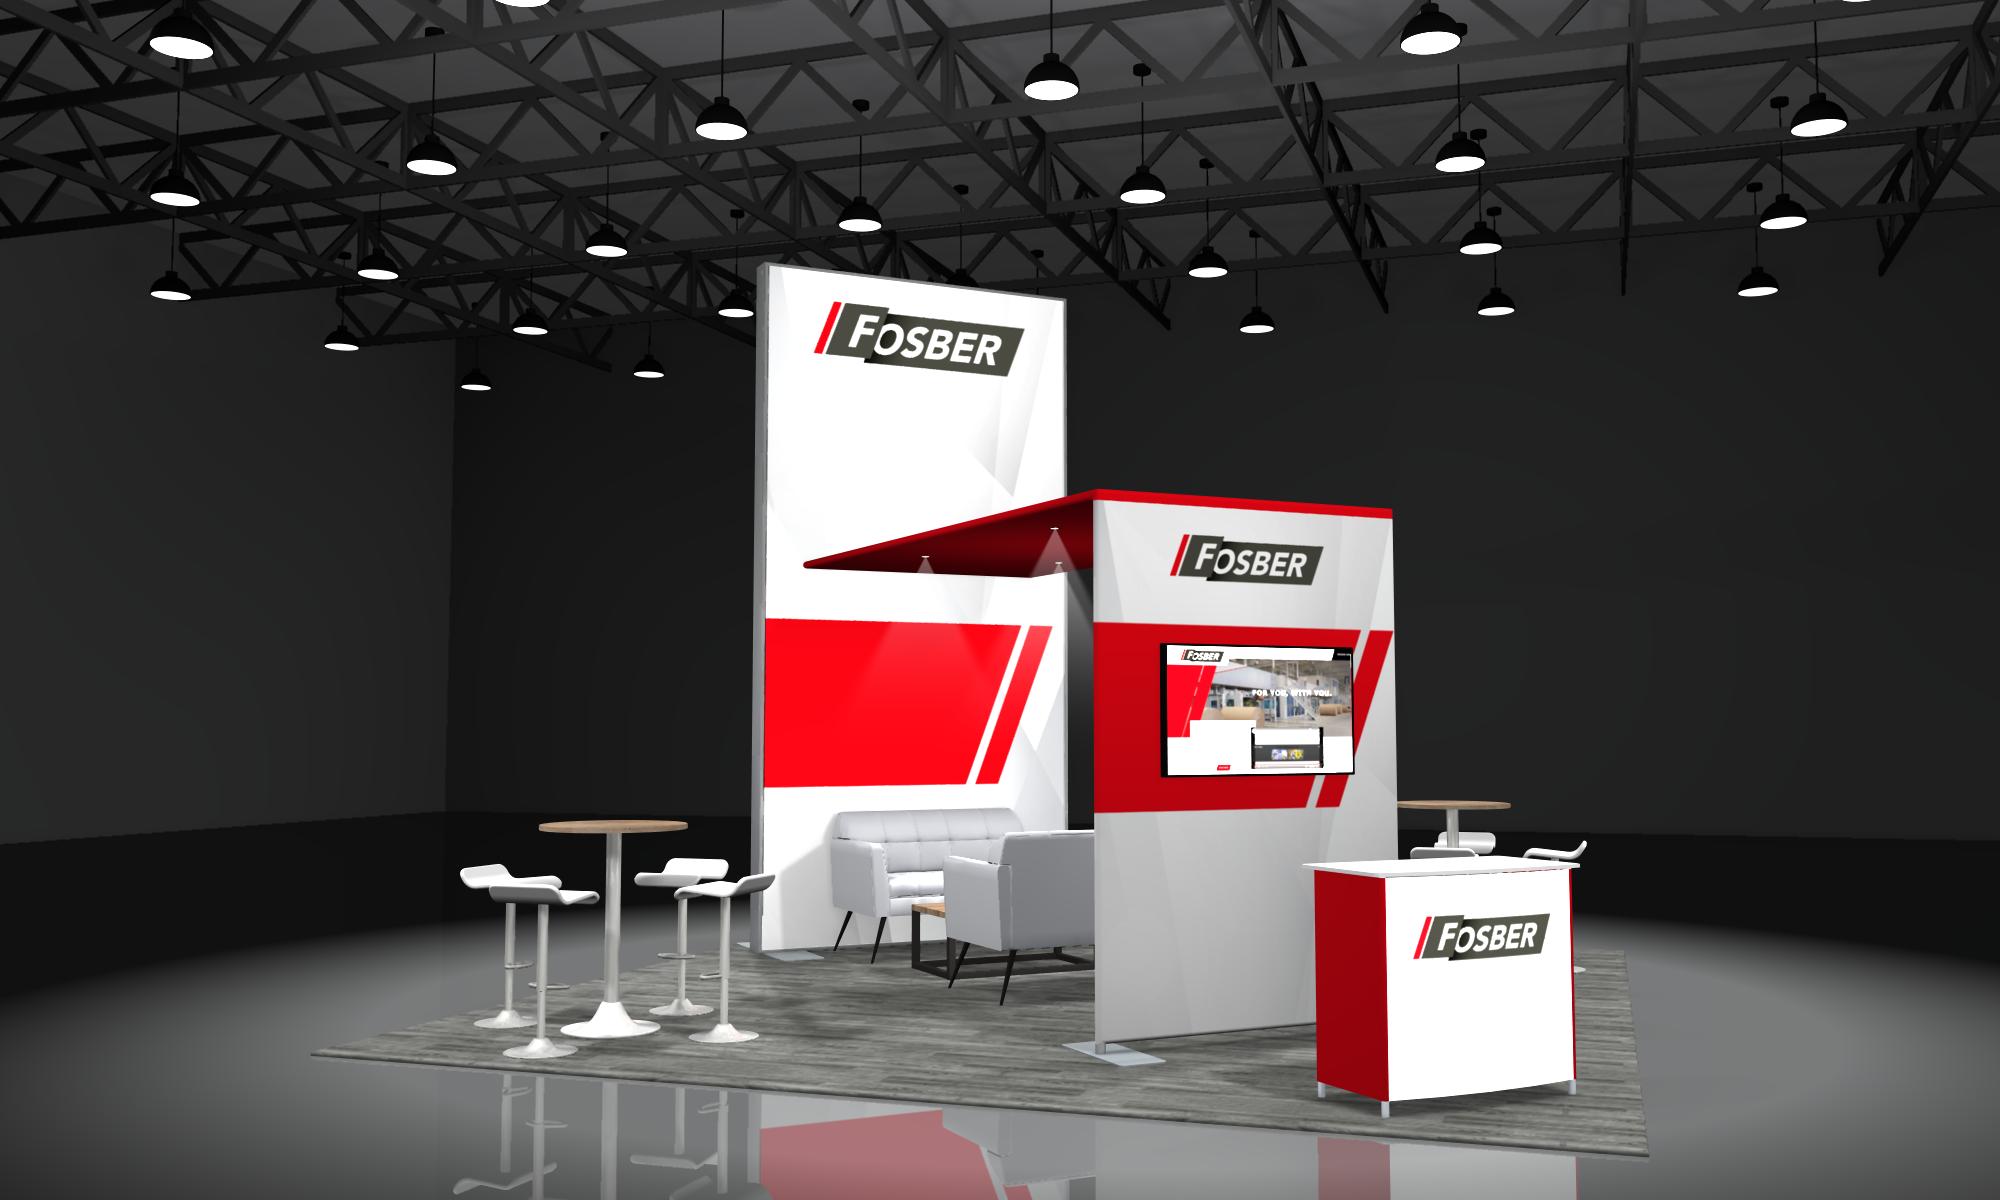 modular 20x20 trade show booths